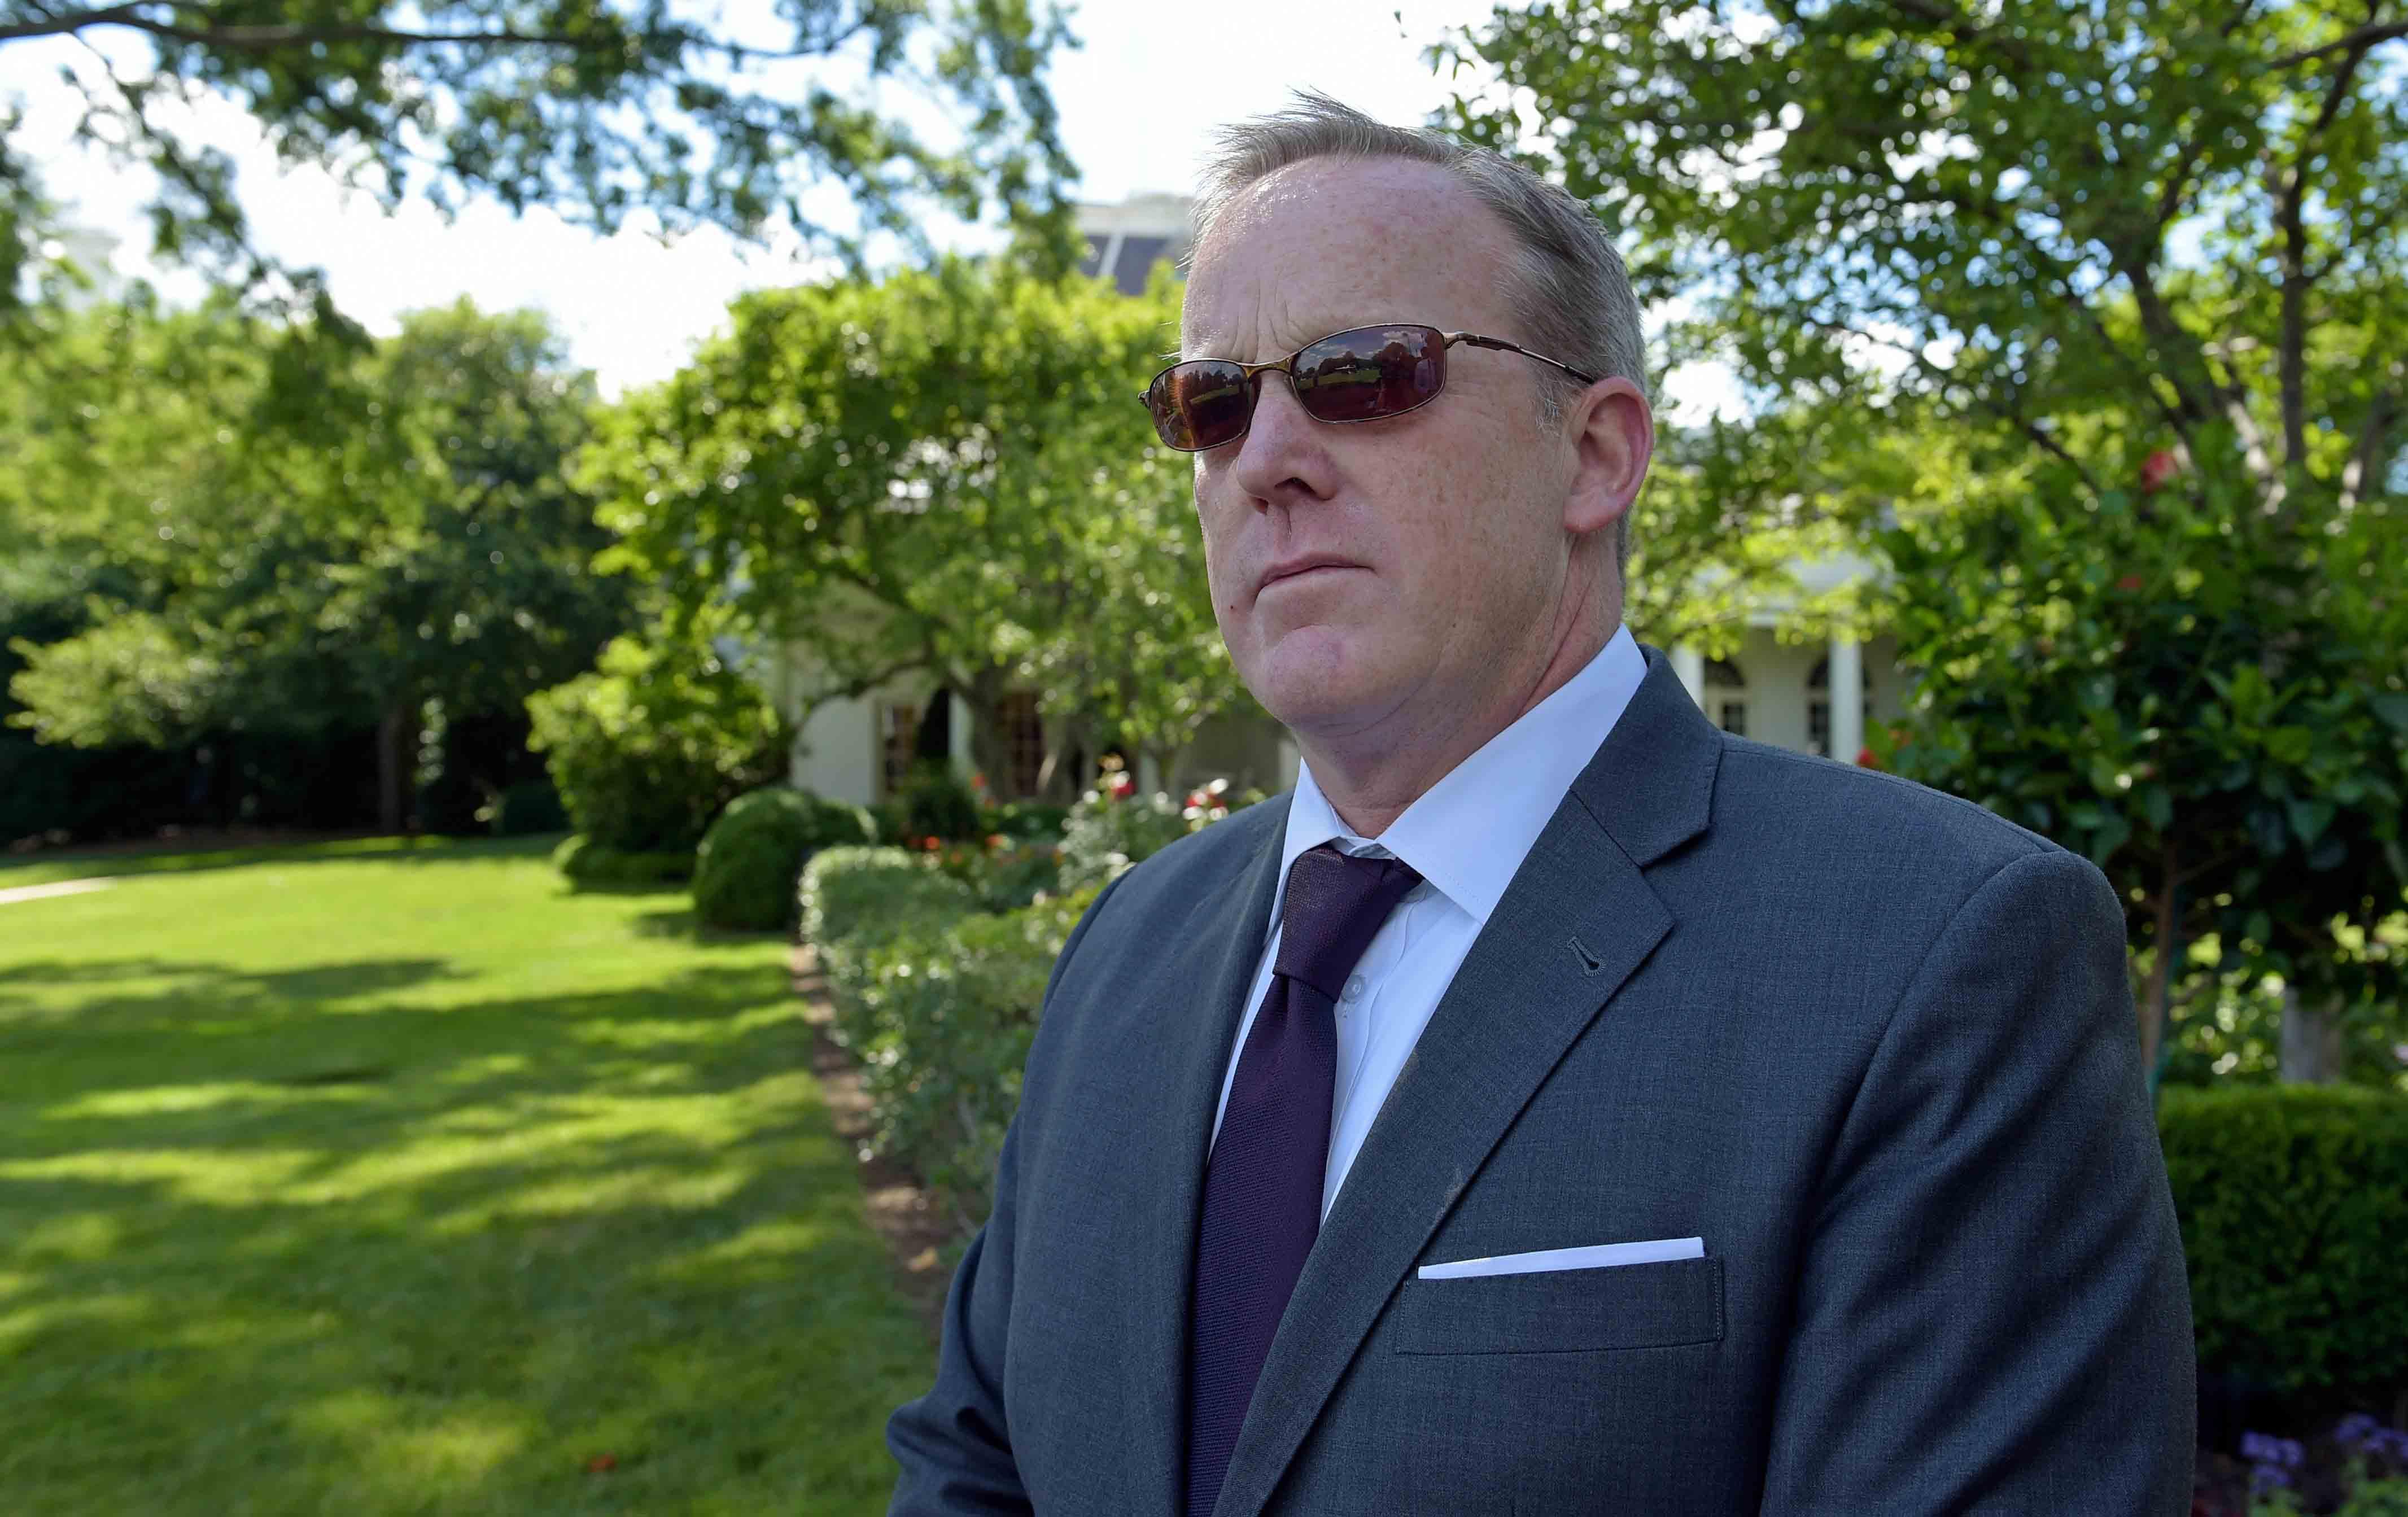 Sean Spicer Sunglasses